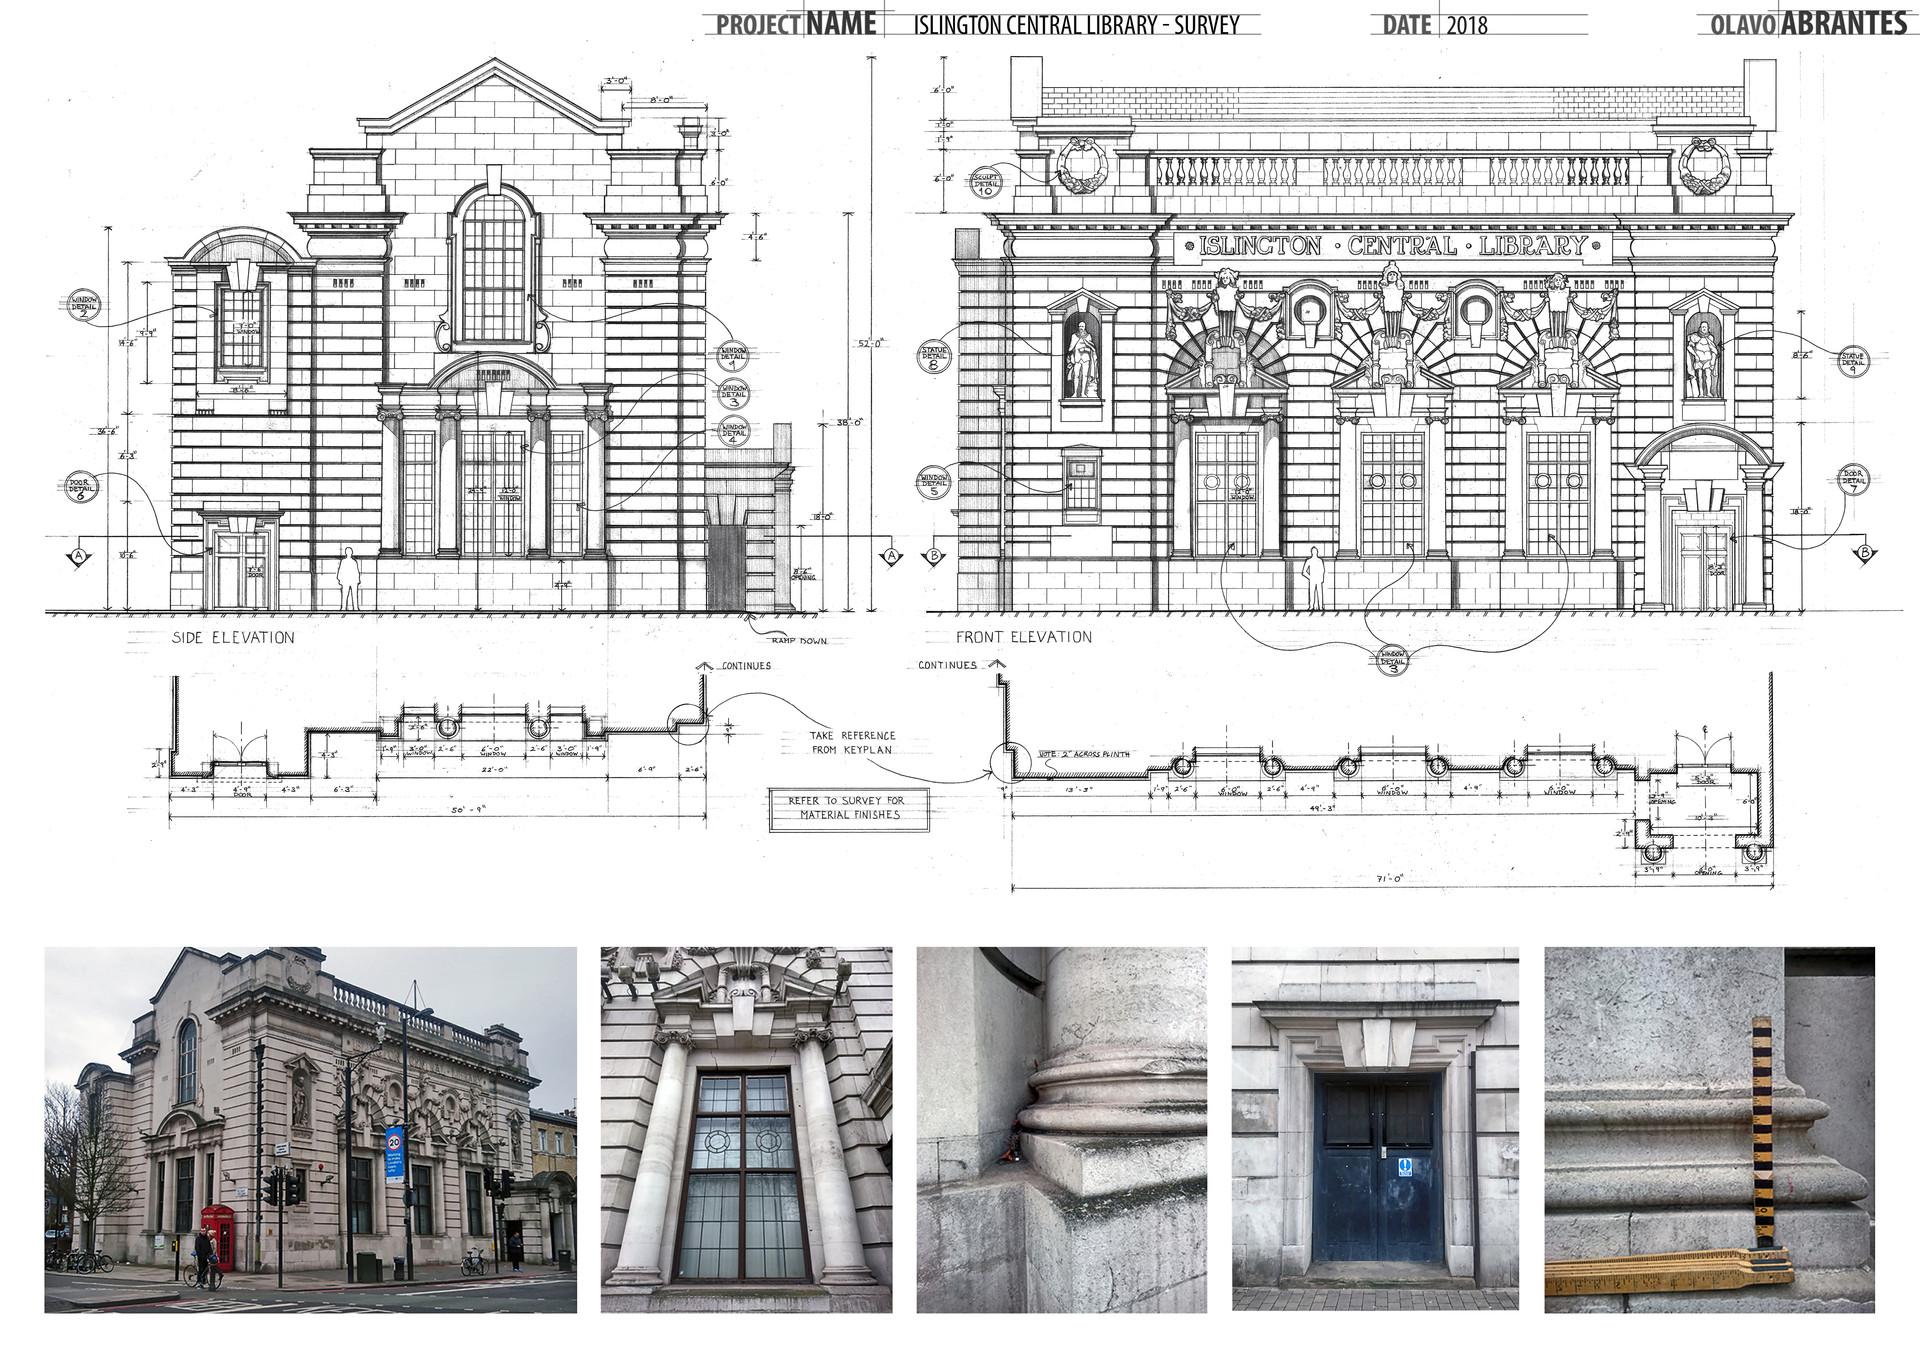 Islington Central Library - Survey